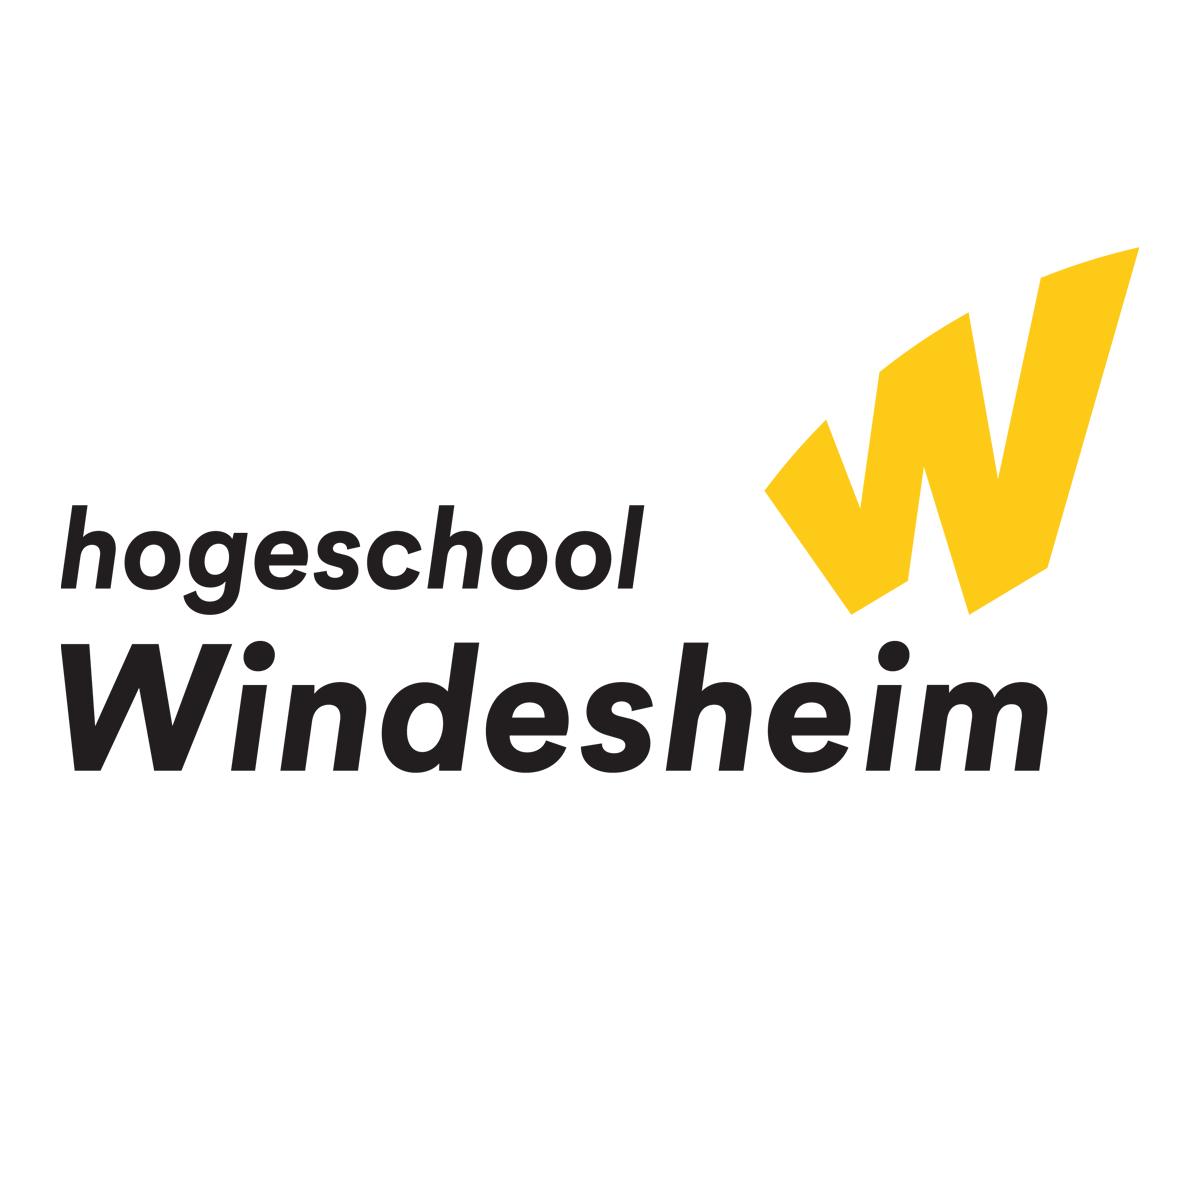 HogeschoolWindesheim.png